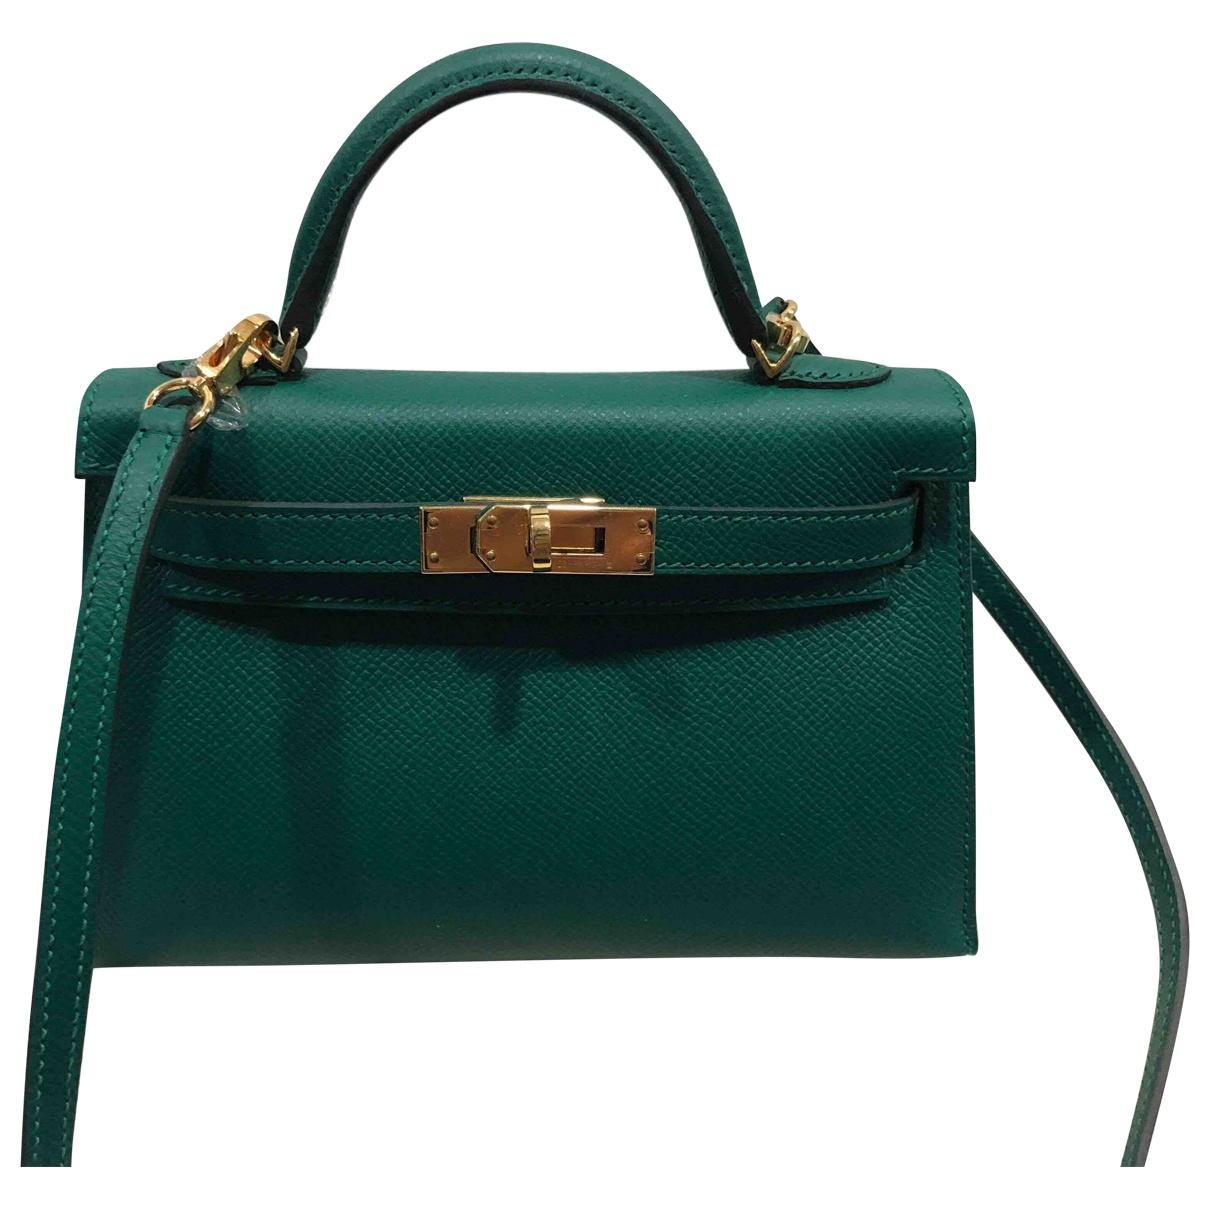 cbfce65cbe Hermès Pre-owned Kelly Mini Leather Mini Bag in Green - Lyst